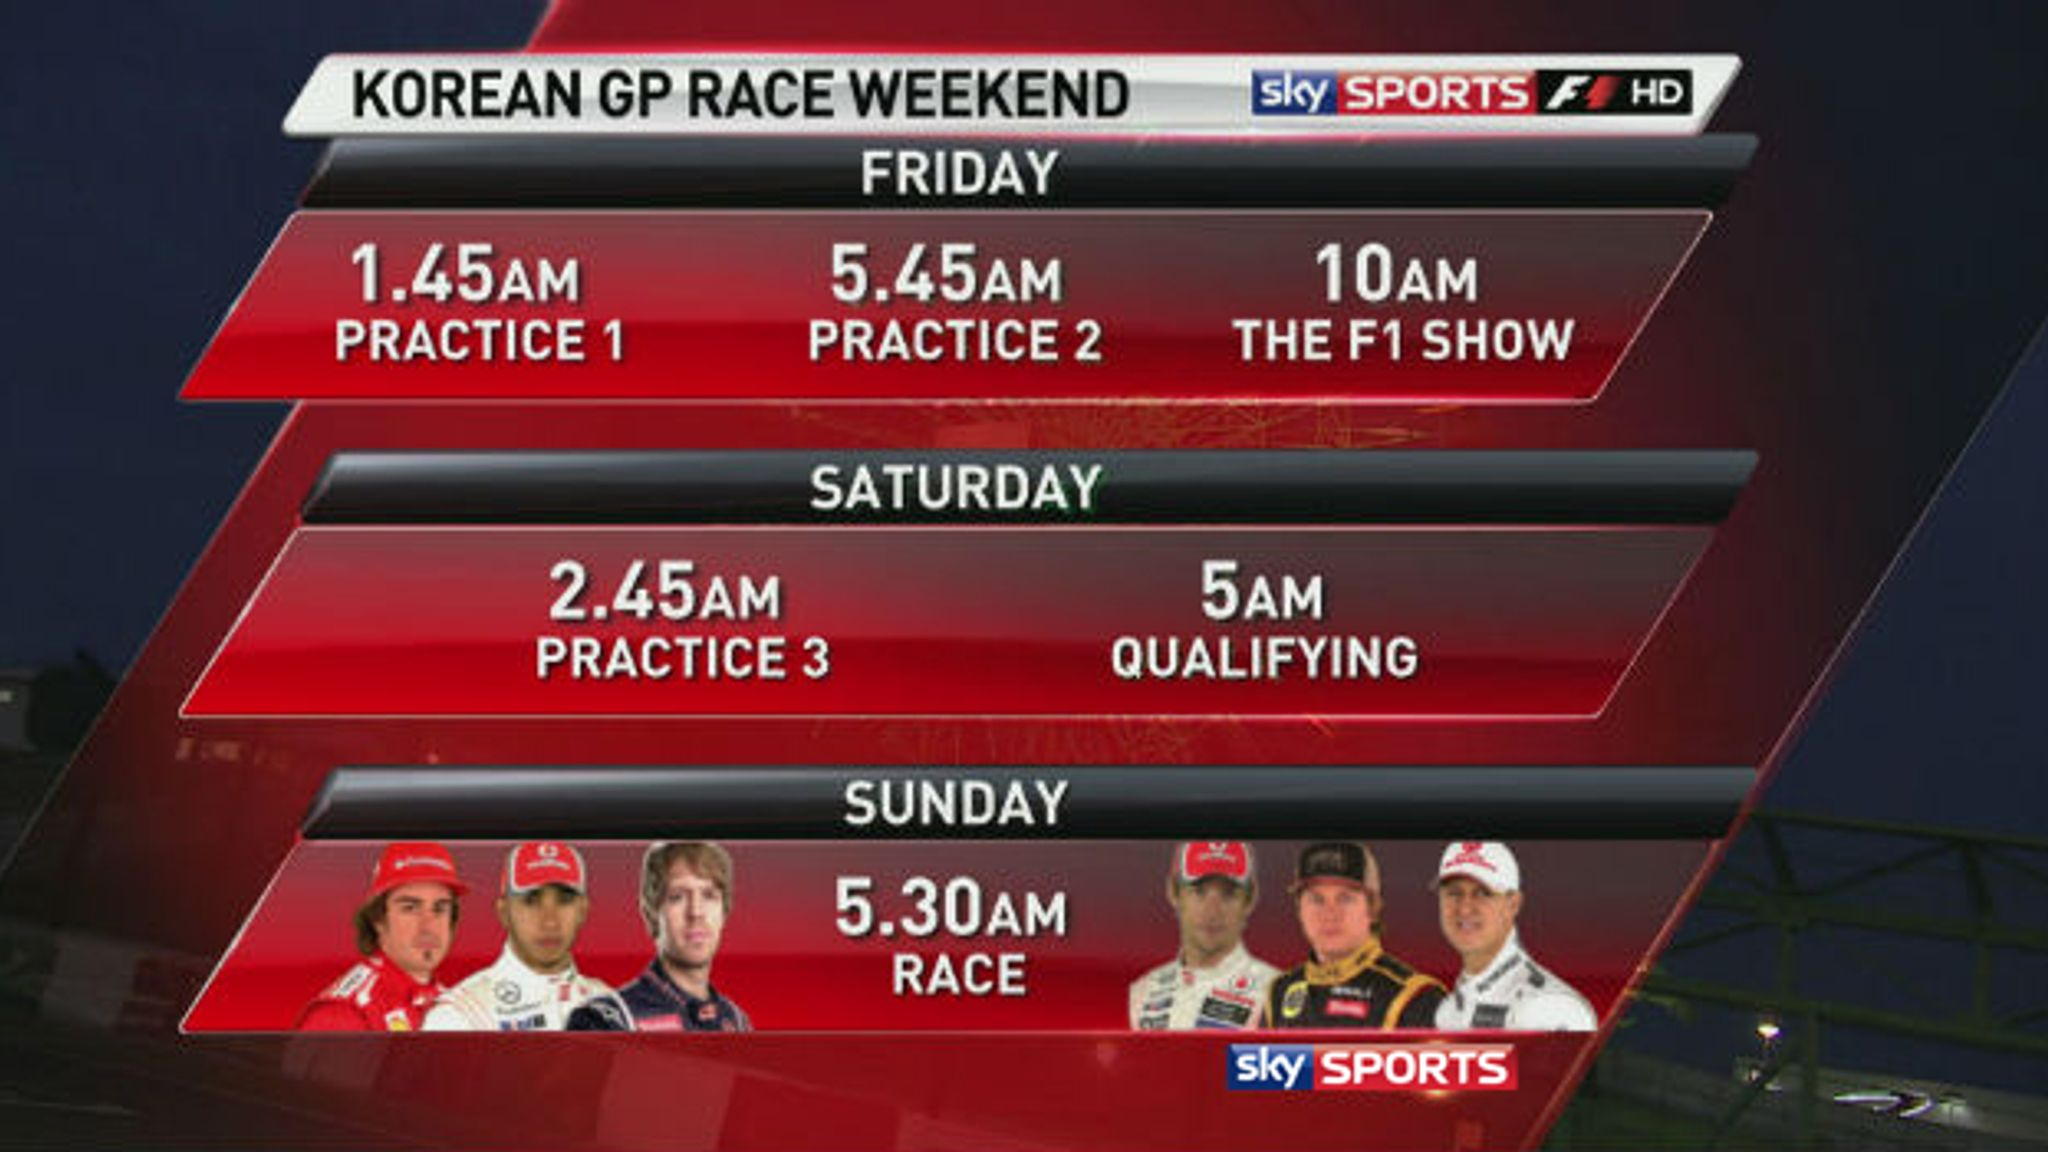 Sky Sports F1's Korean GP schedule